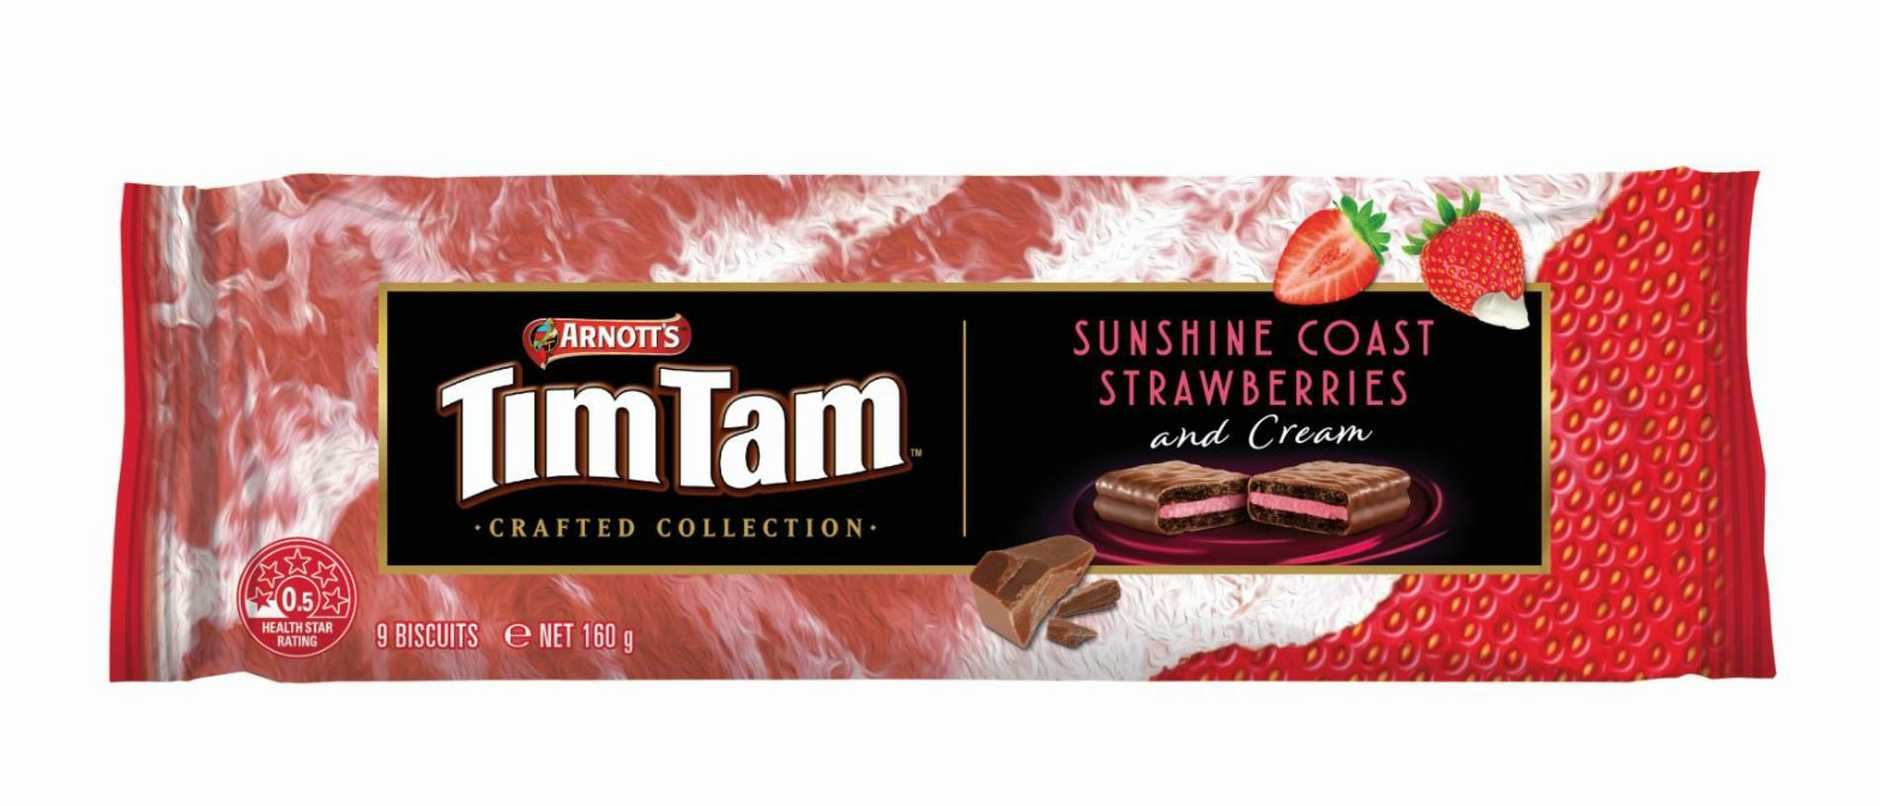 The Sunshine Coast Strawberries and Cream Tim Tam will hit shelves next week. Photo: Contributed